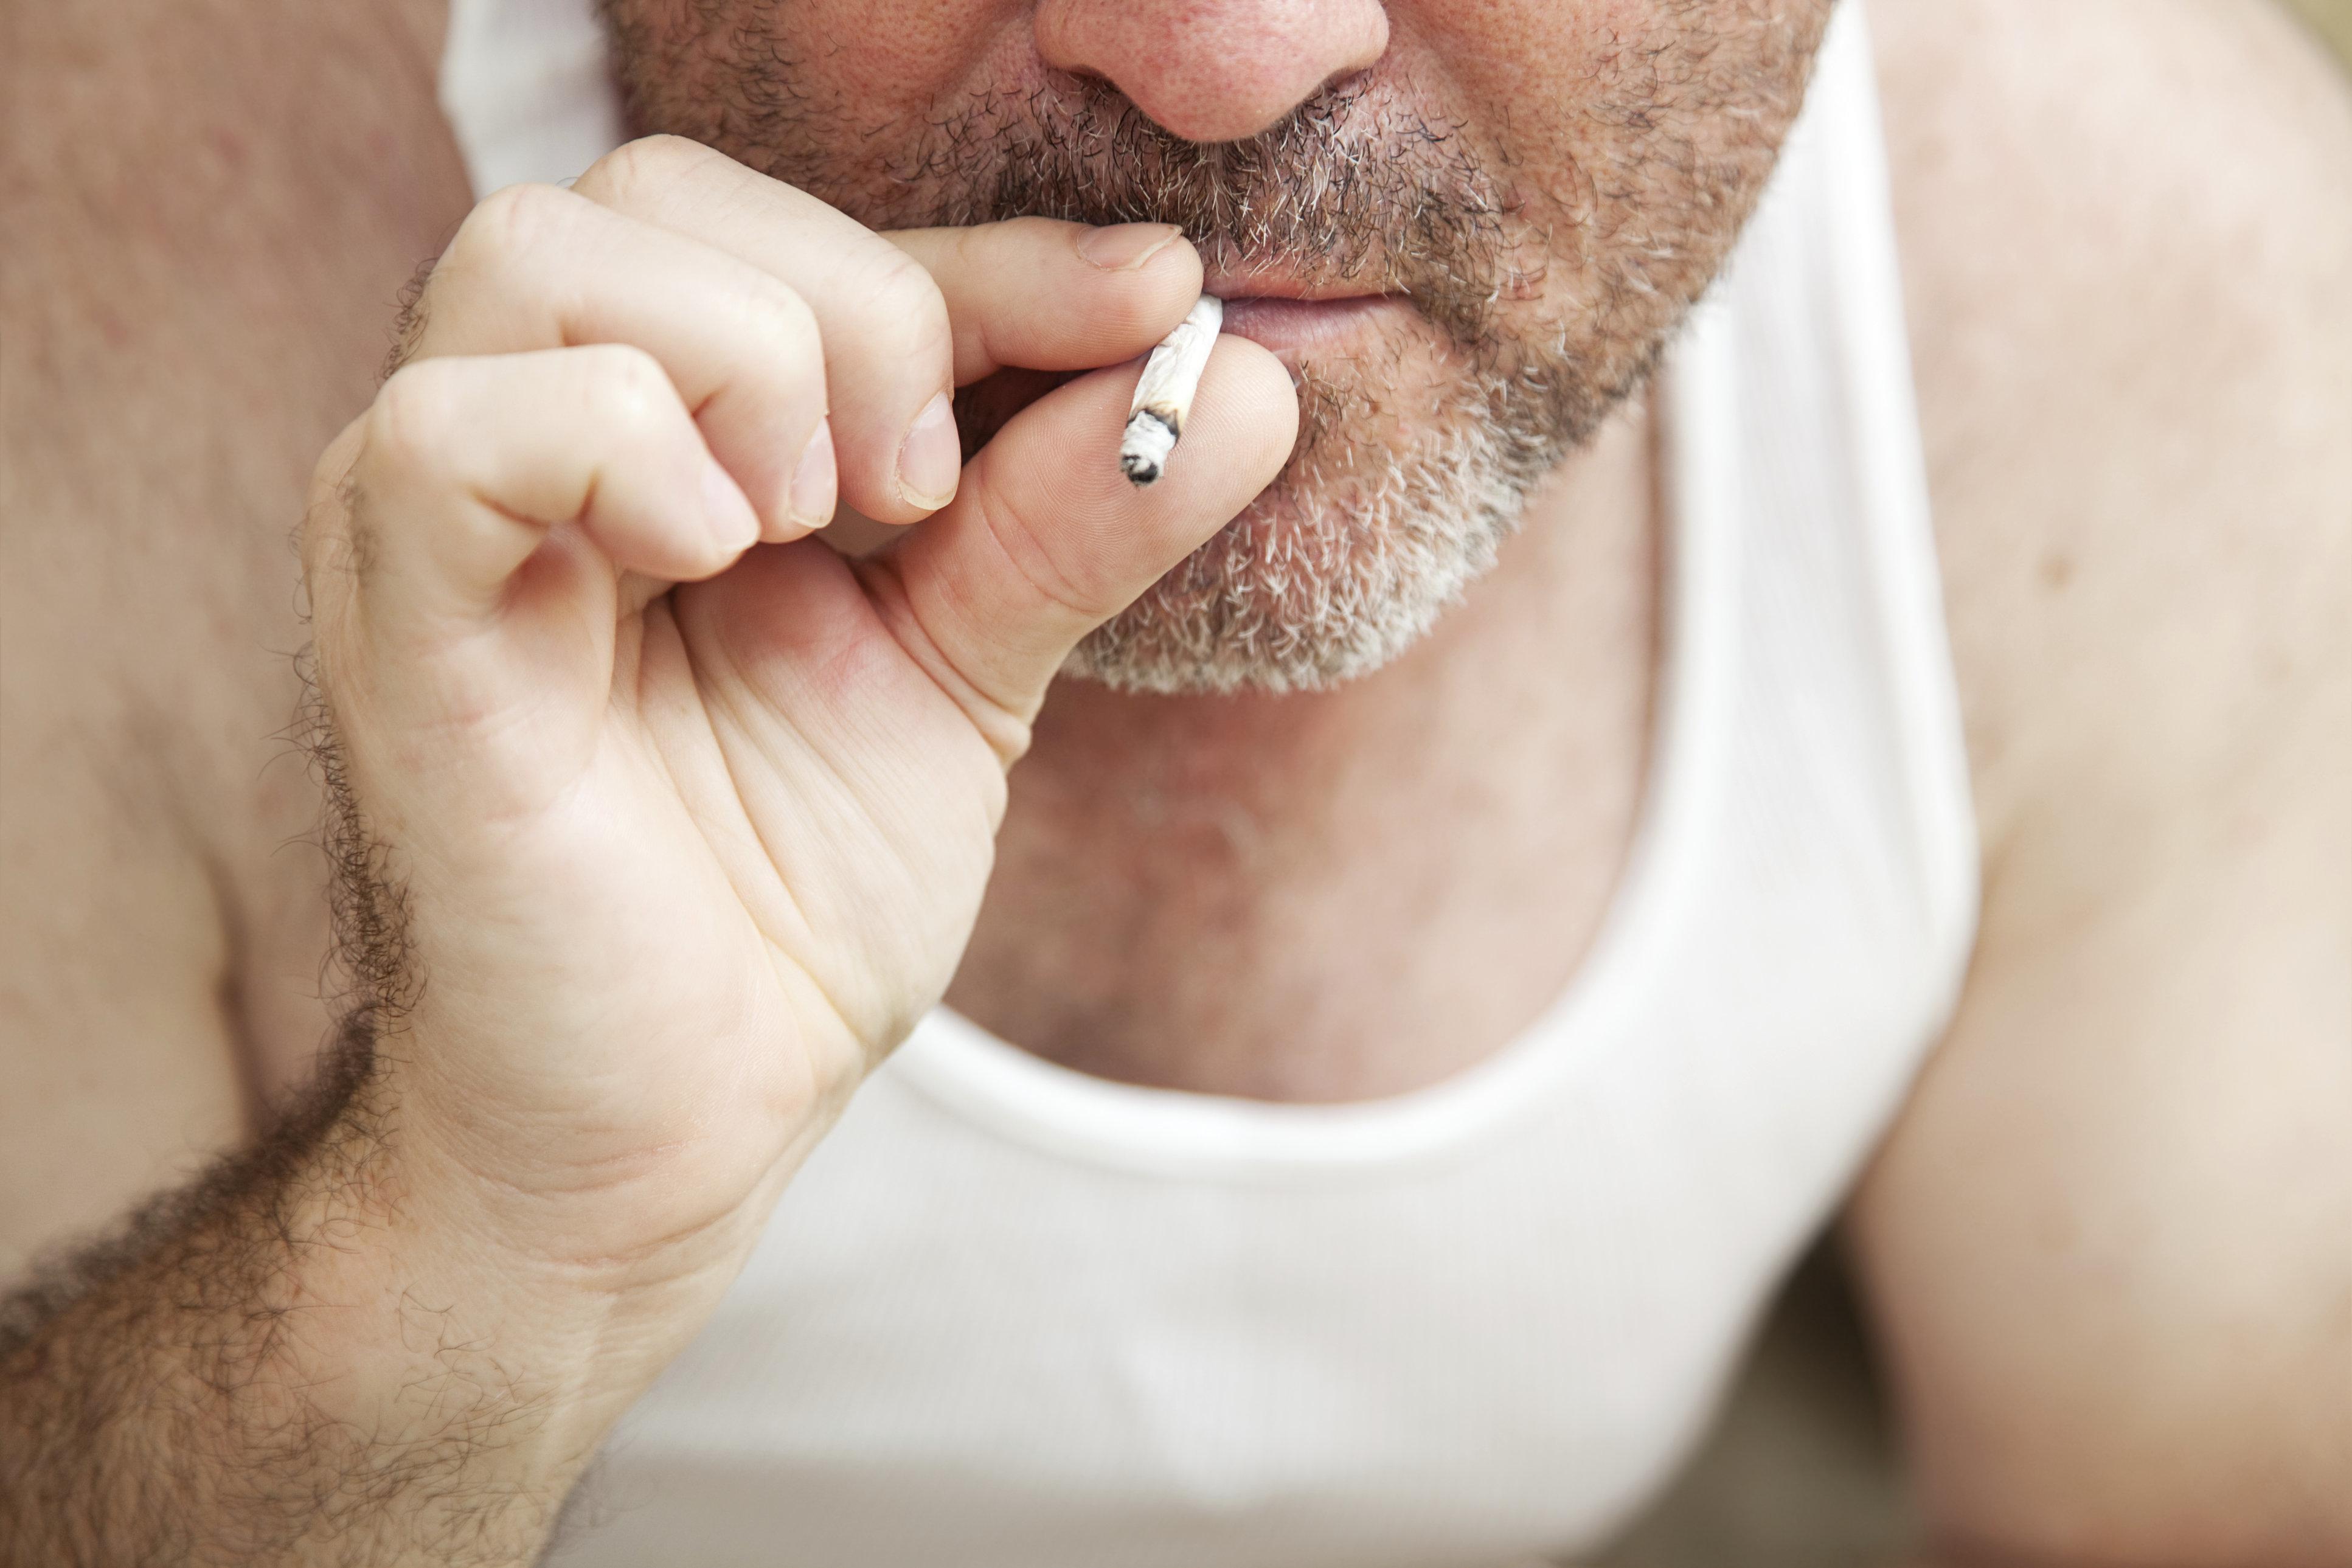 Parents Are Turning To Marijuana More Than Teens, Study